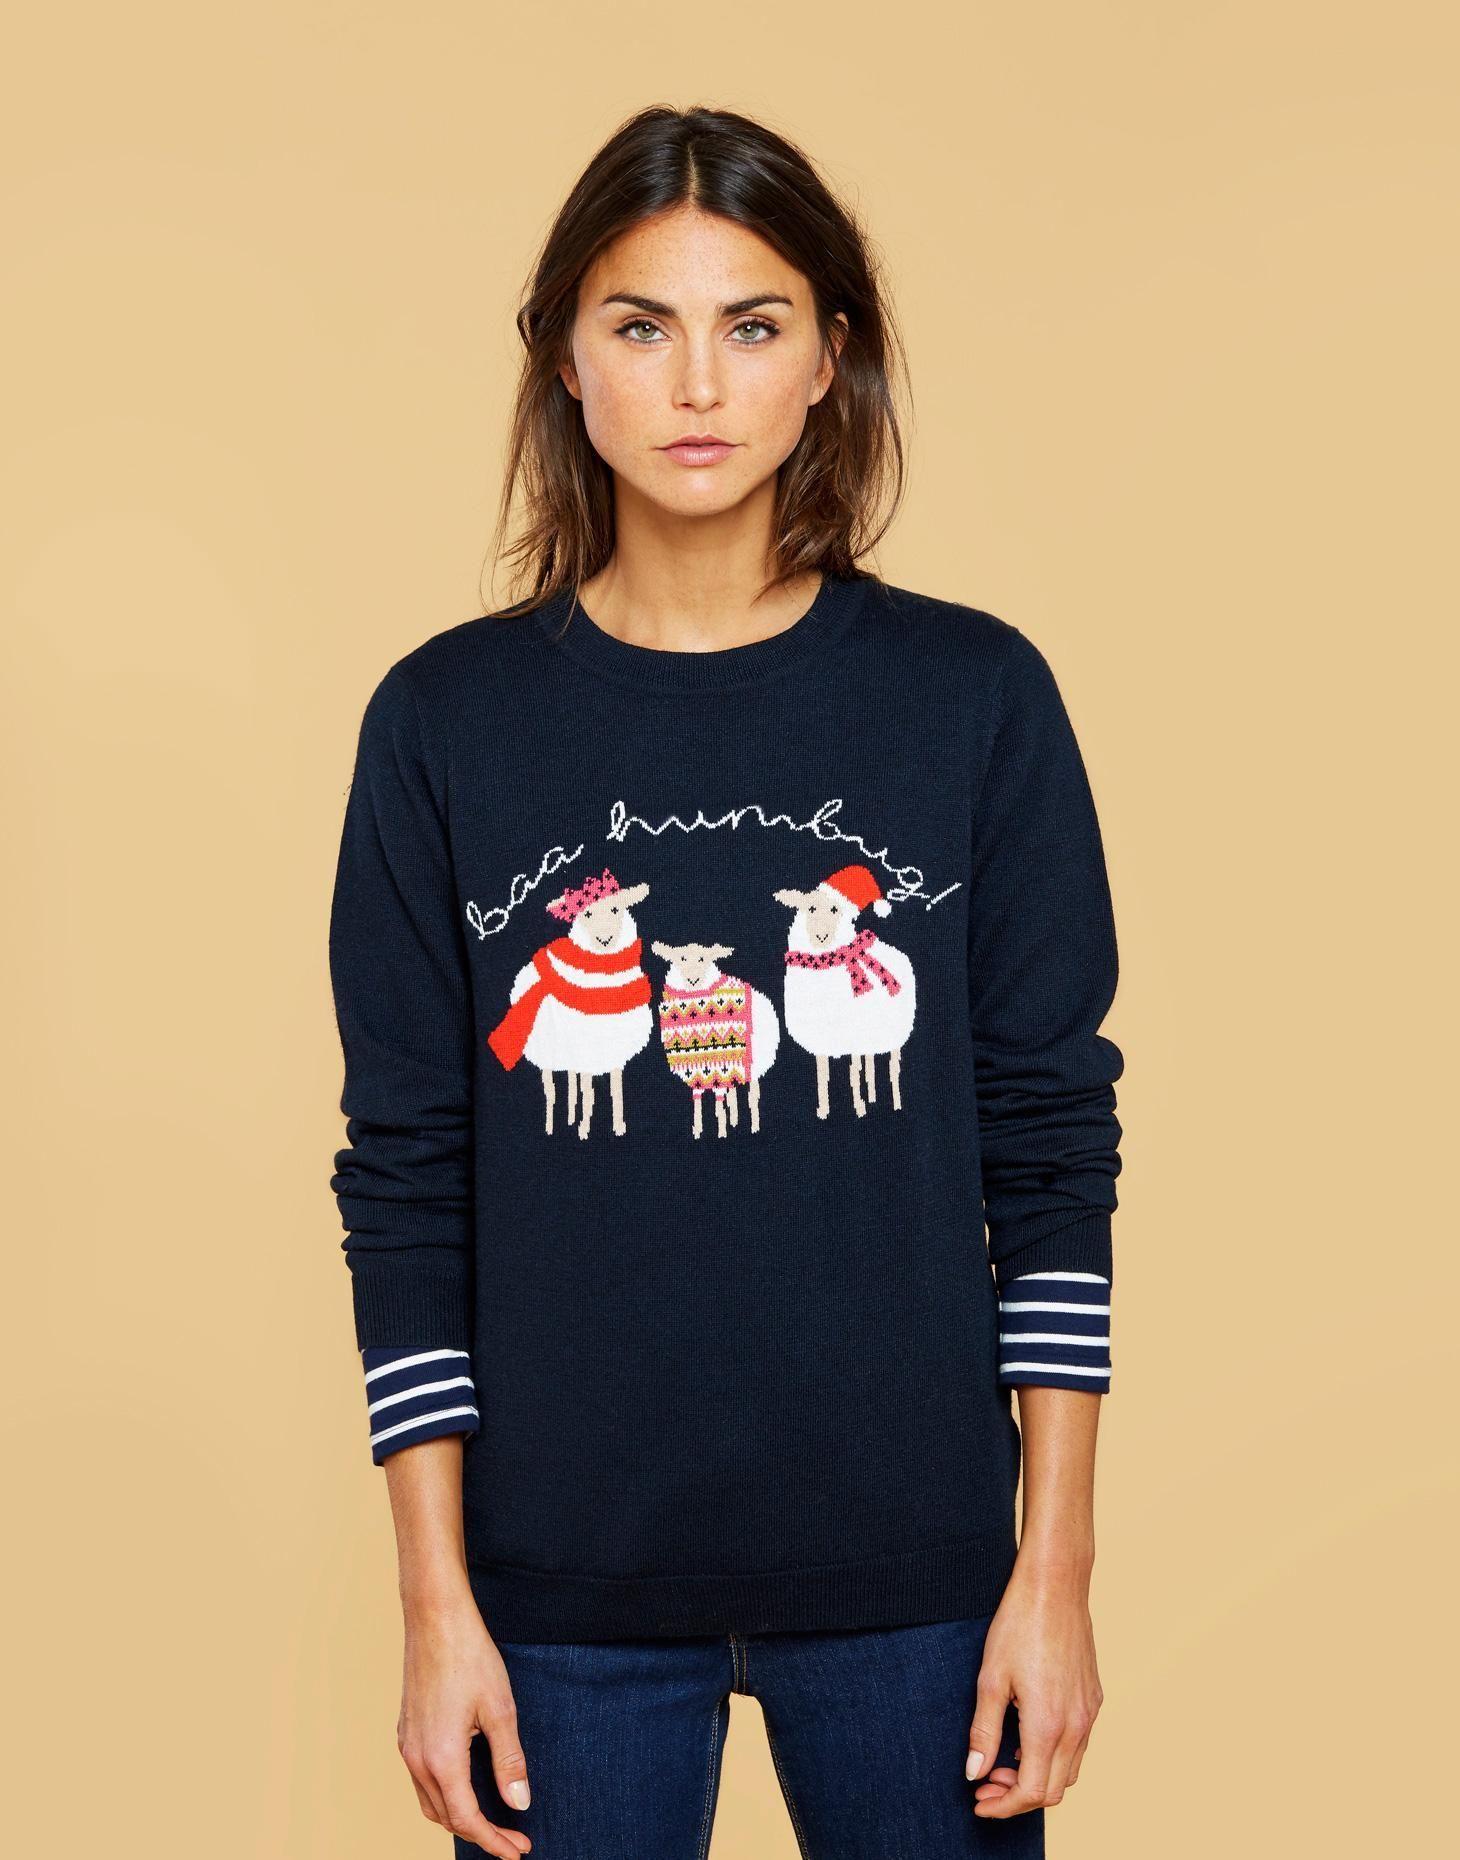 Jaz Christmas Jumper Christmas jumpers, Womens christmas